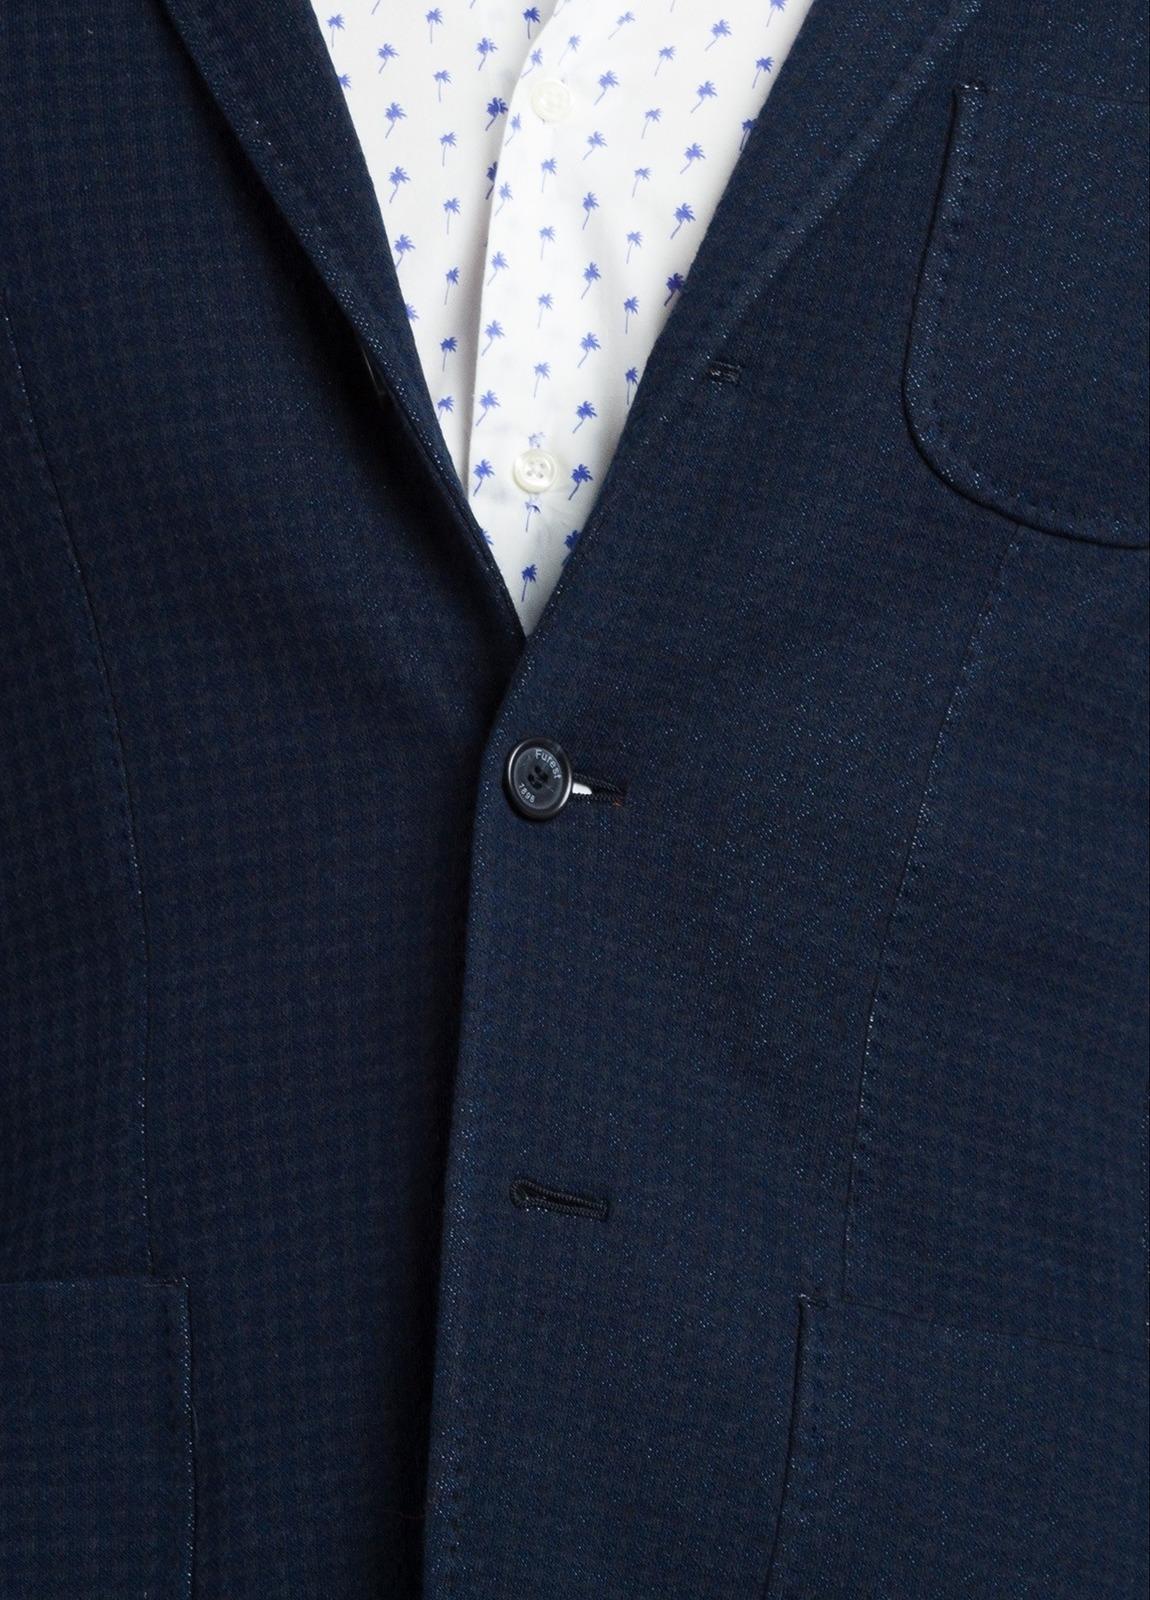 Americana SOFT JACKET Slim Fit textura color azul marino, 100% Algodón. - Ítem2